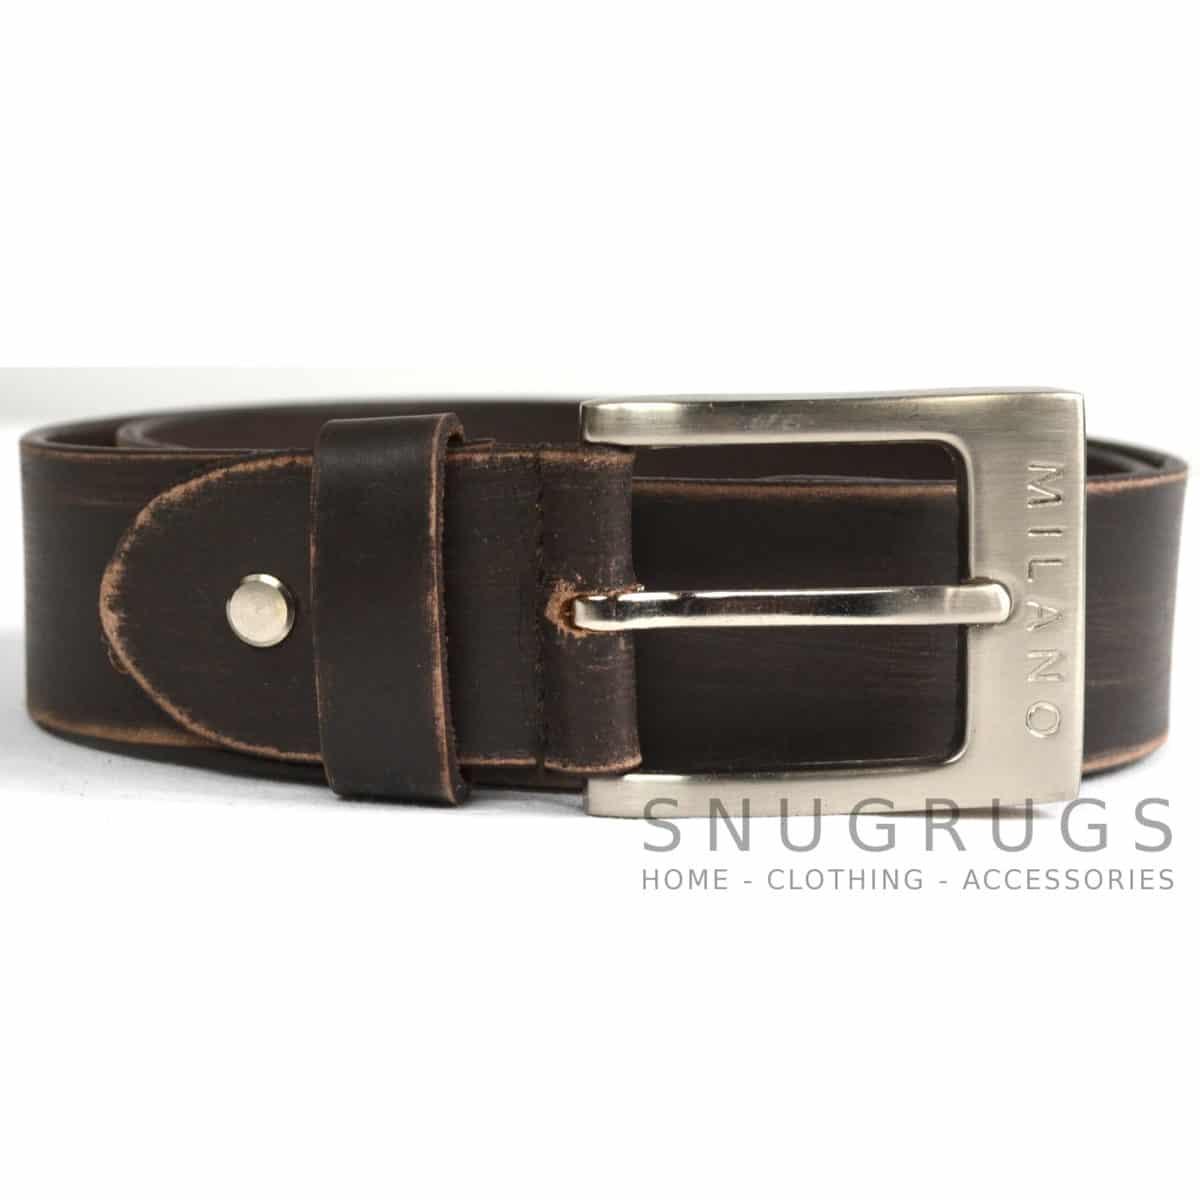 "Full Leather 1.5"" Milano Belt - Brown"